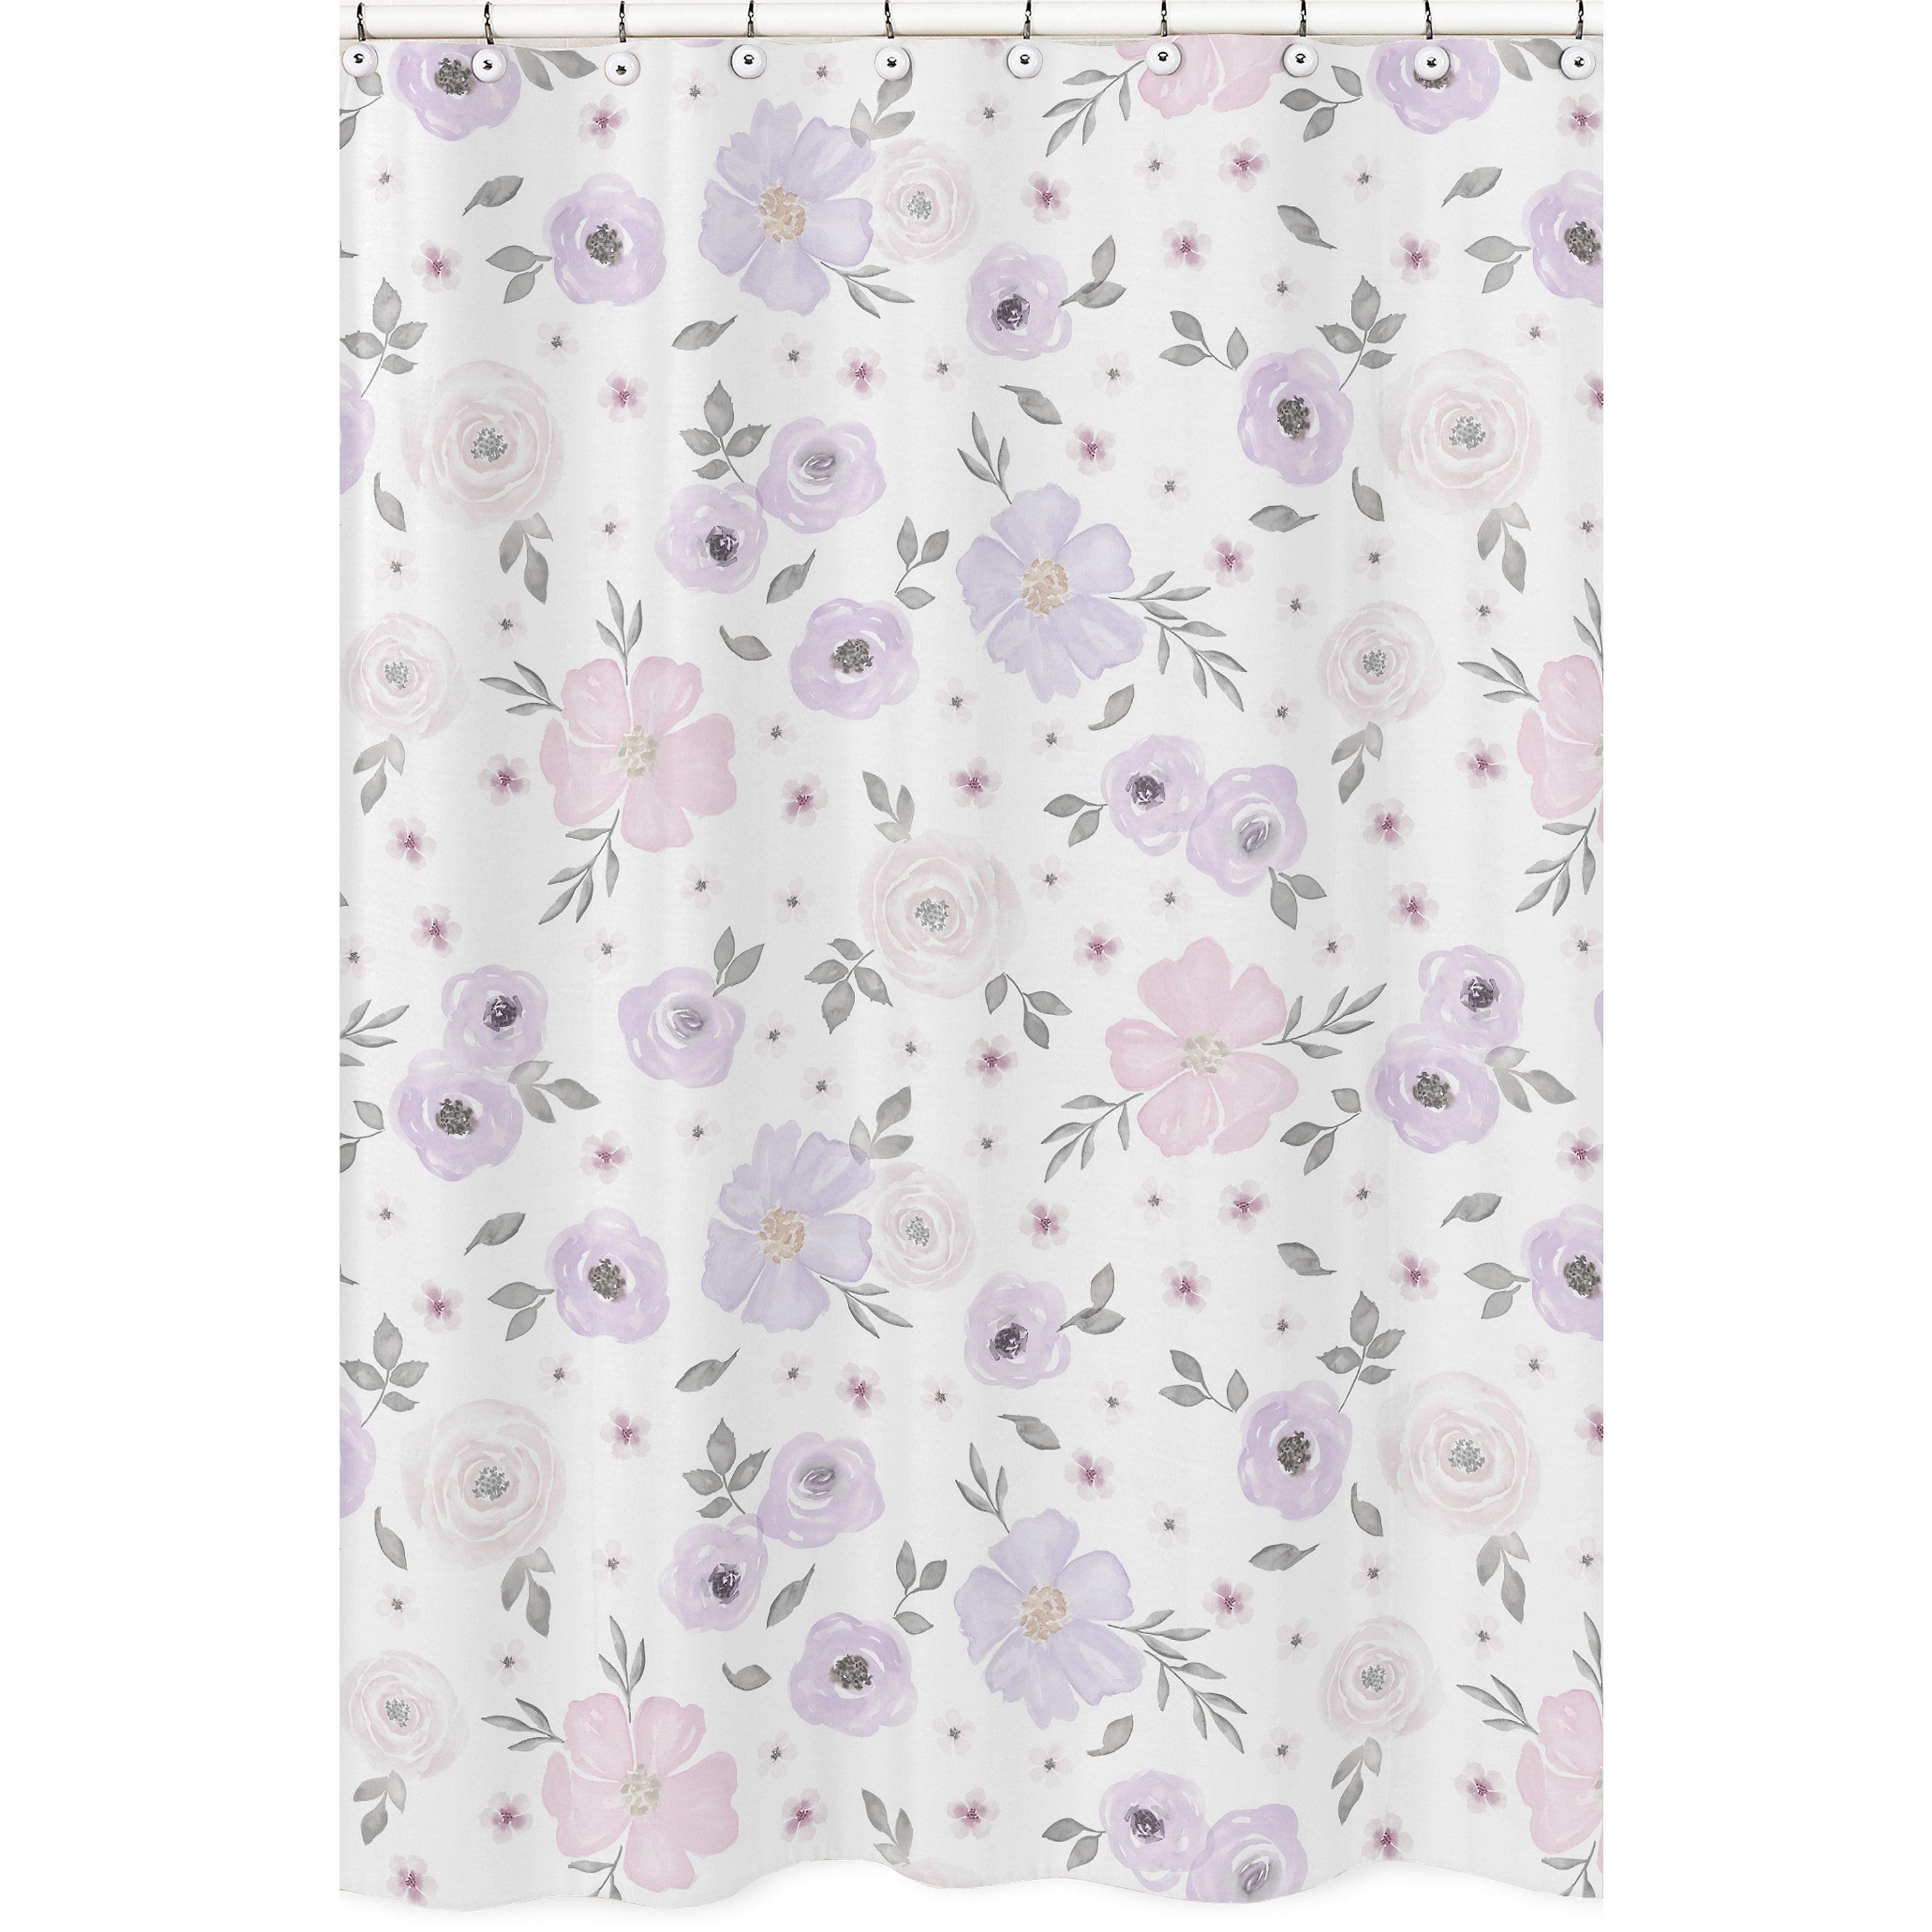 Keepsake Calico Cotton Fabric -Watercolor Pink Purple